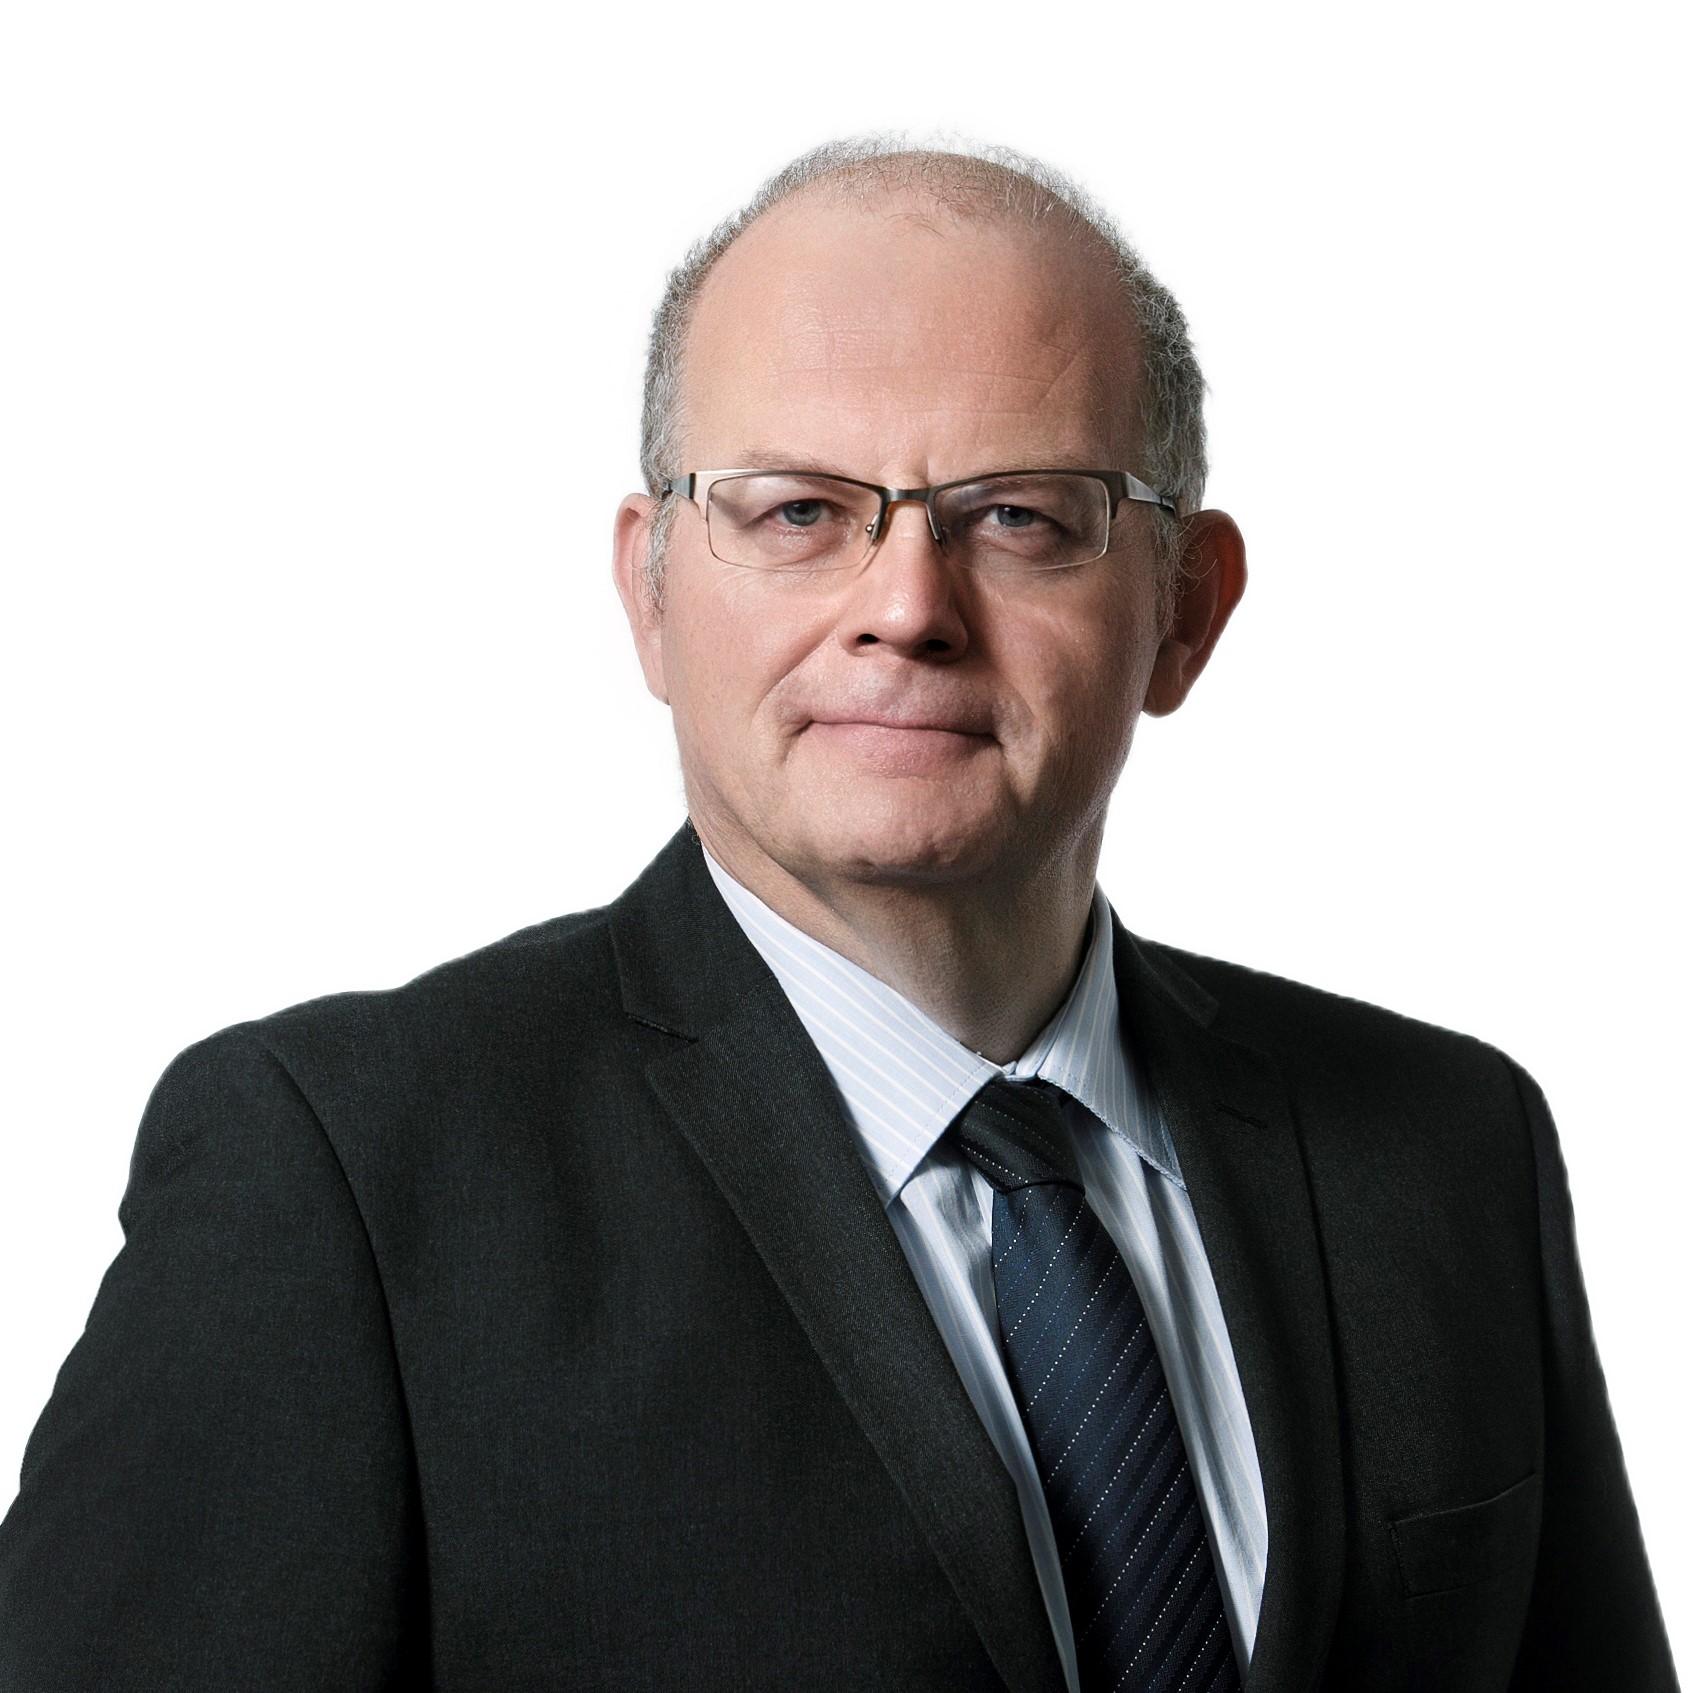 James Kavanagh